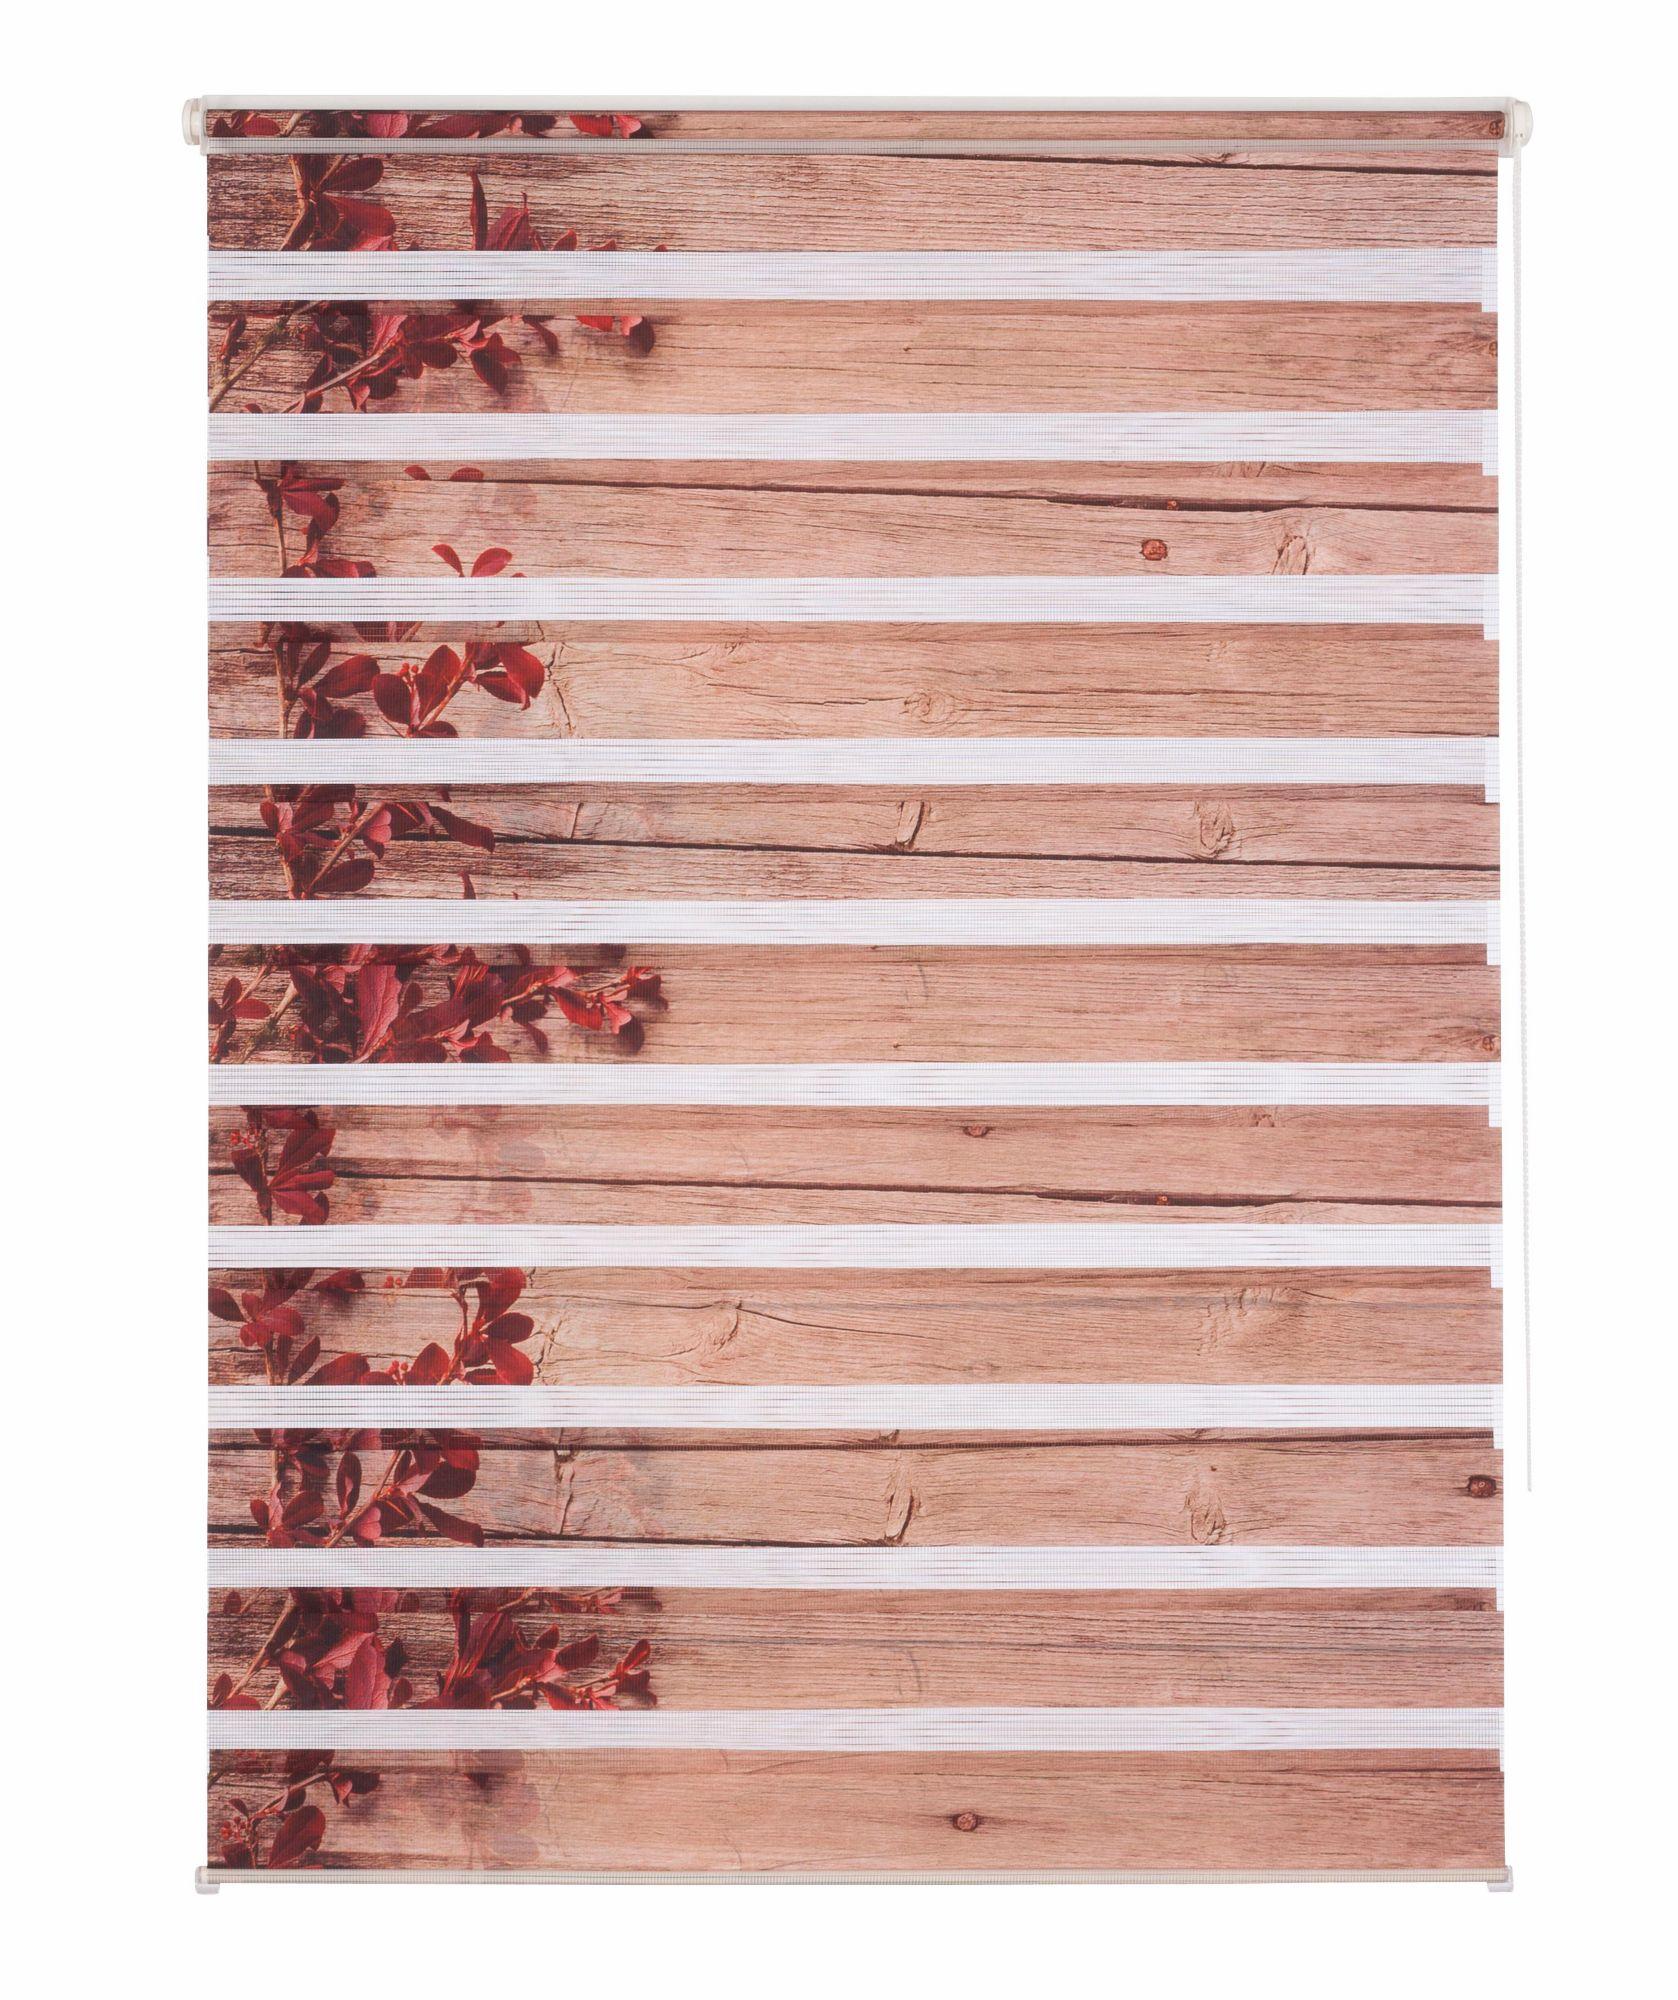 HOME AFFAIRE COLLECTION Doppelrollo, Home affaire Collection, »Shao«, Lichtschutz, Fixmaß, ohne Bohren